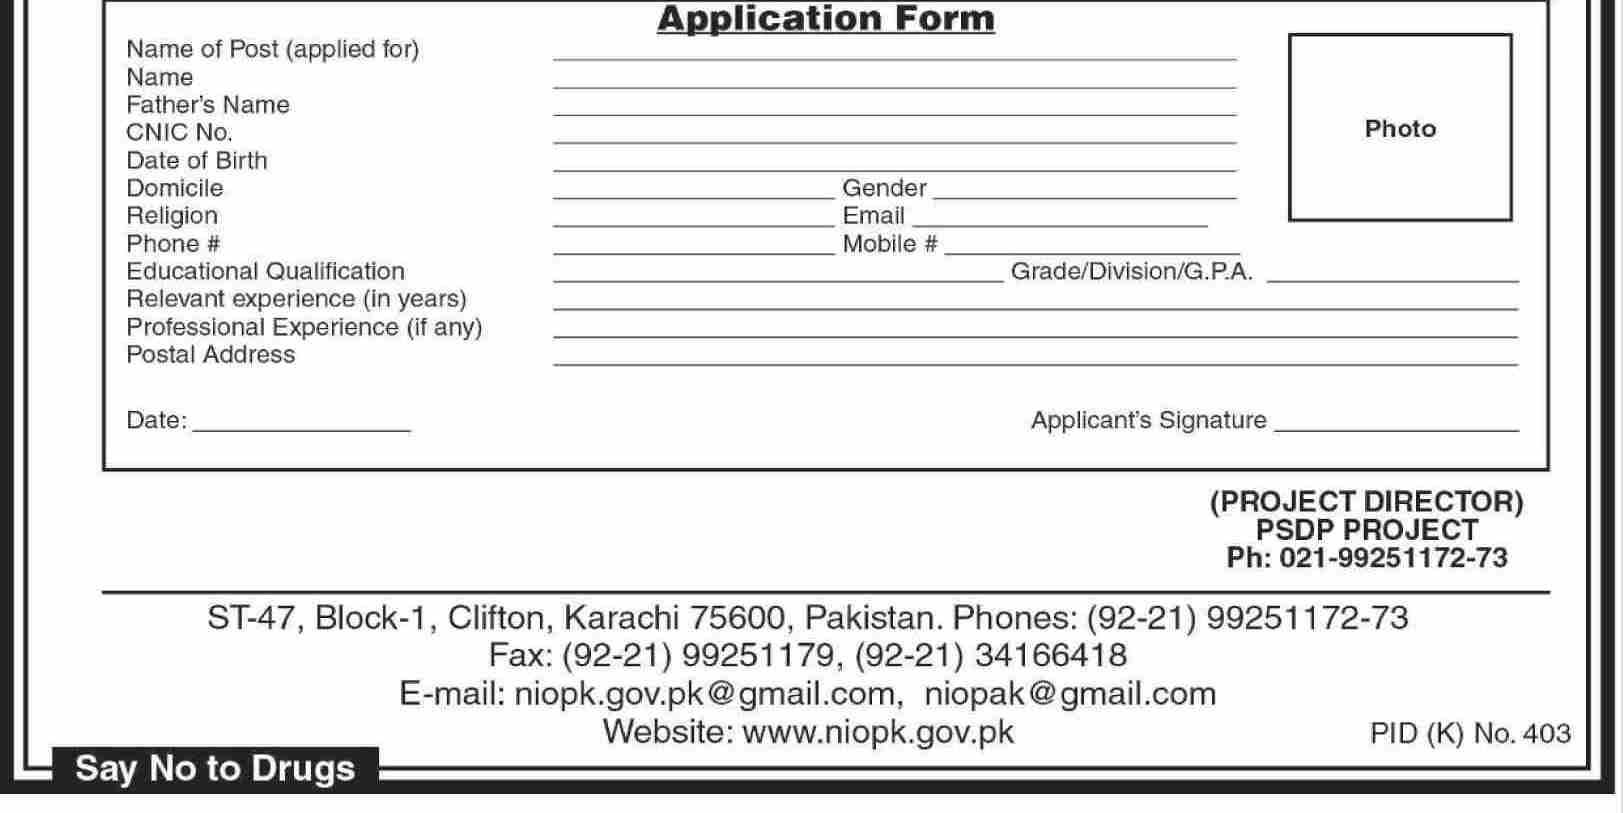 National Institute Of Oceanography Karachi Jobs 2019 Job